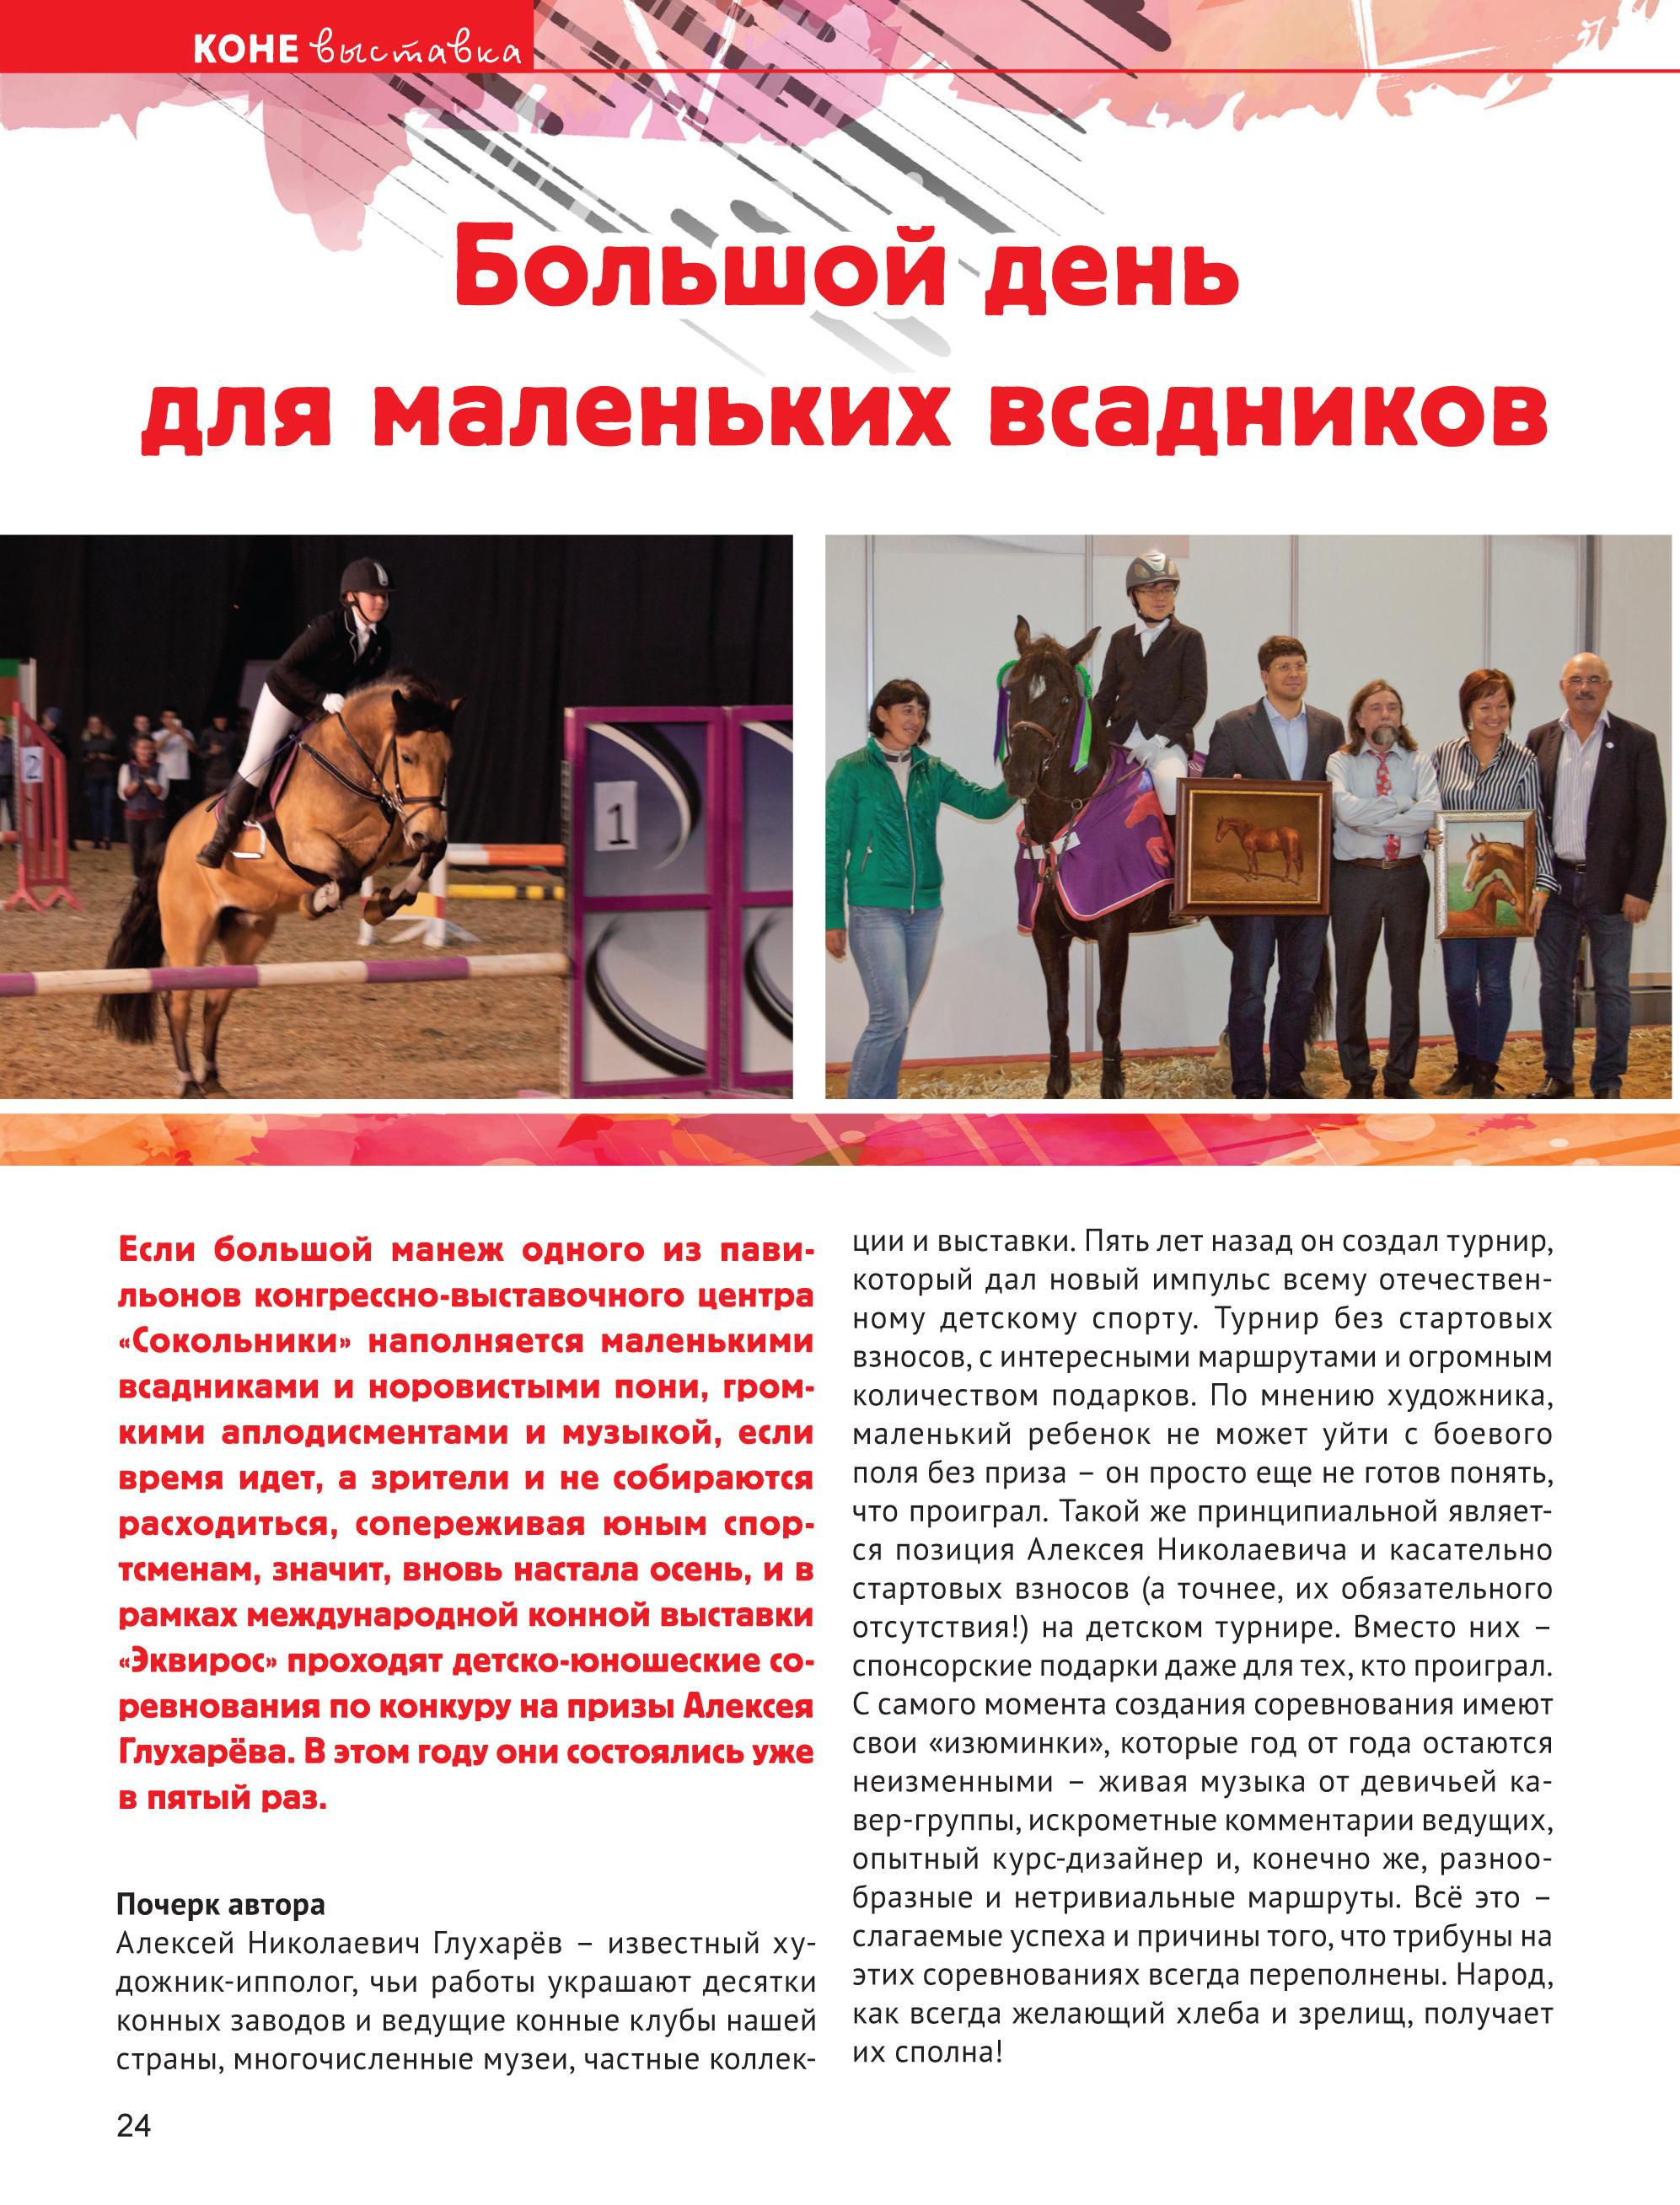 Book KONEVODITEL 62018 print-24